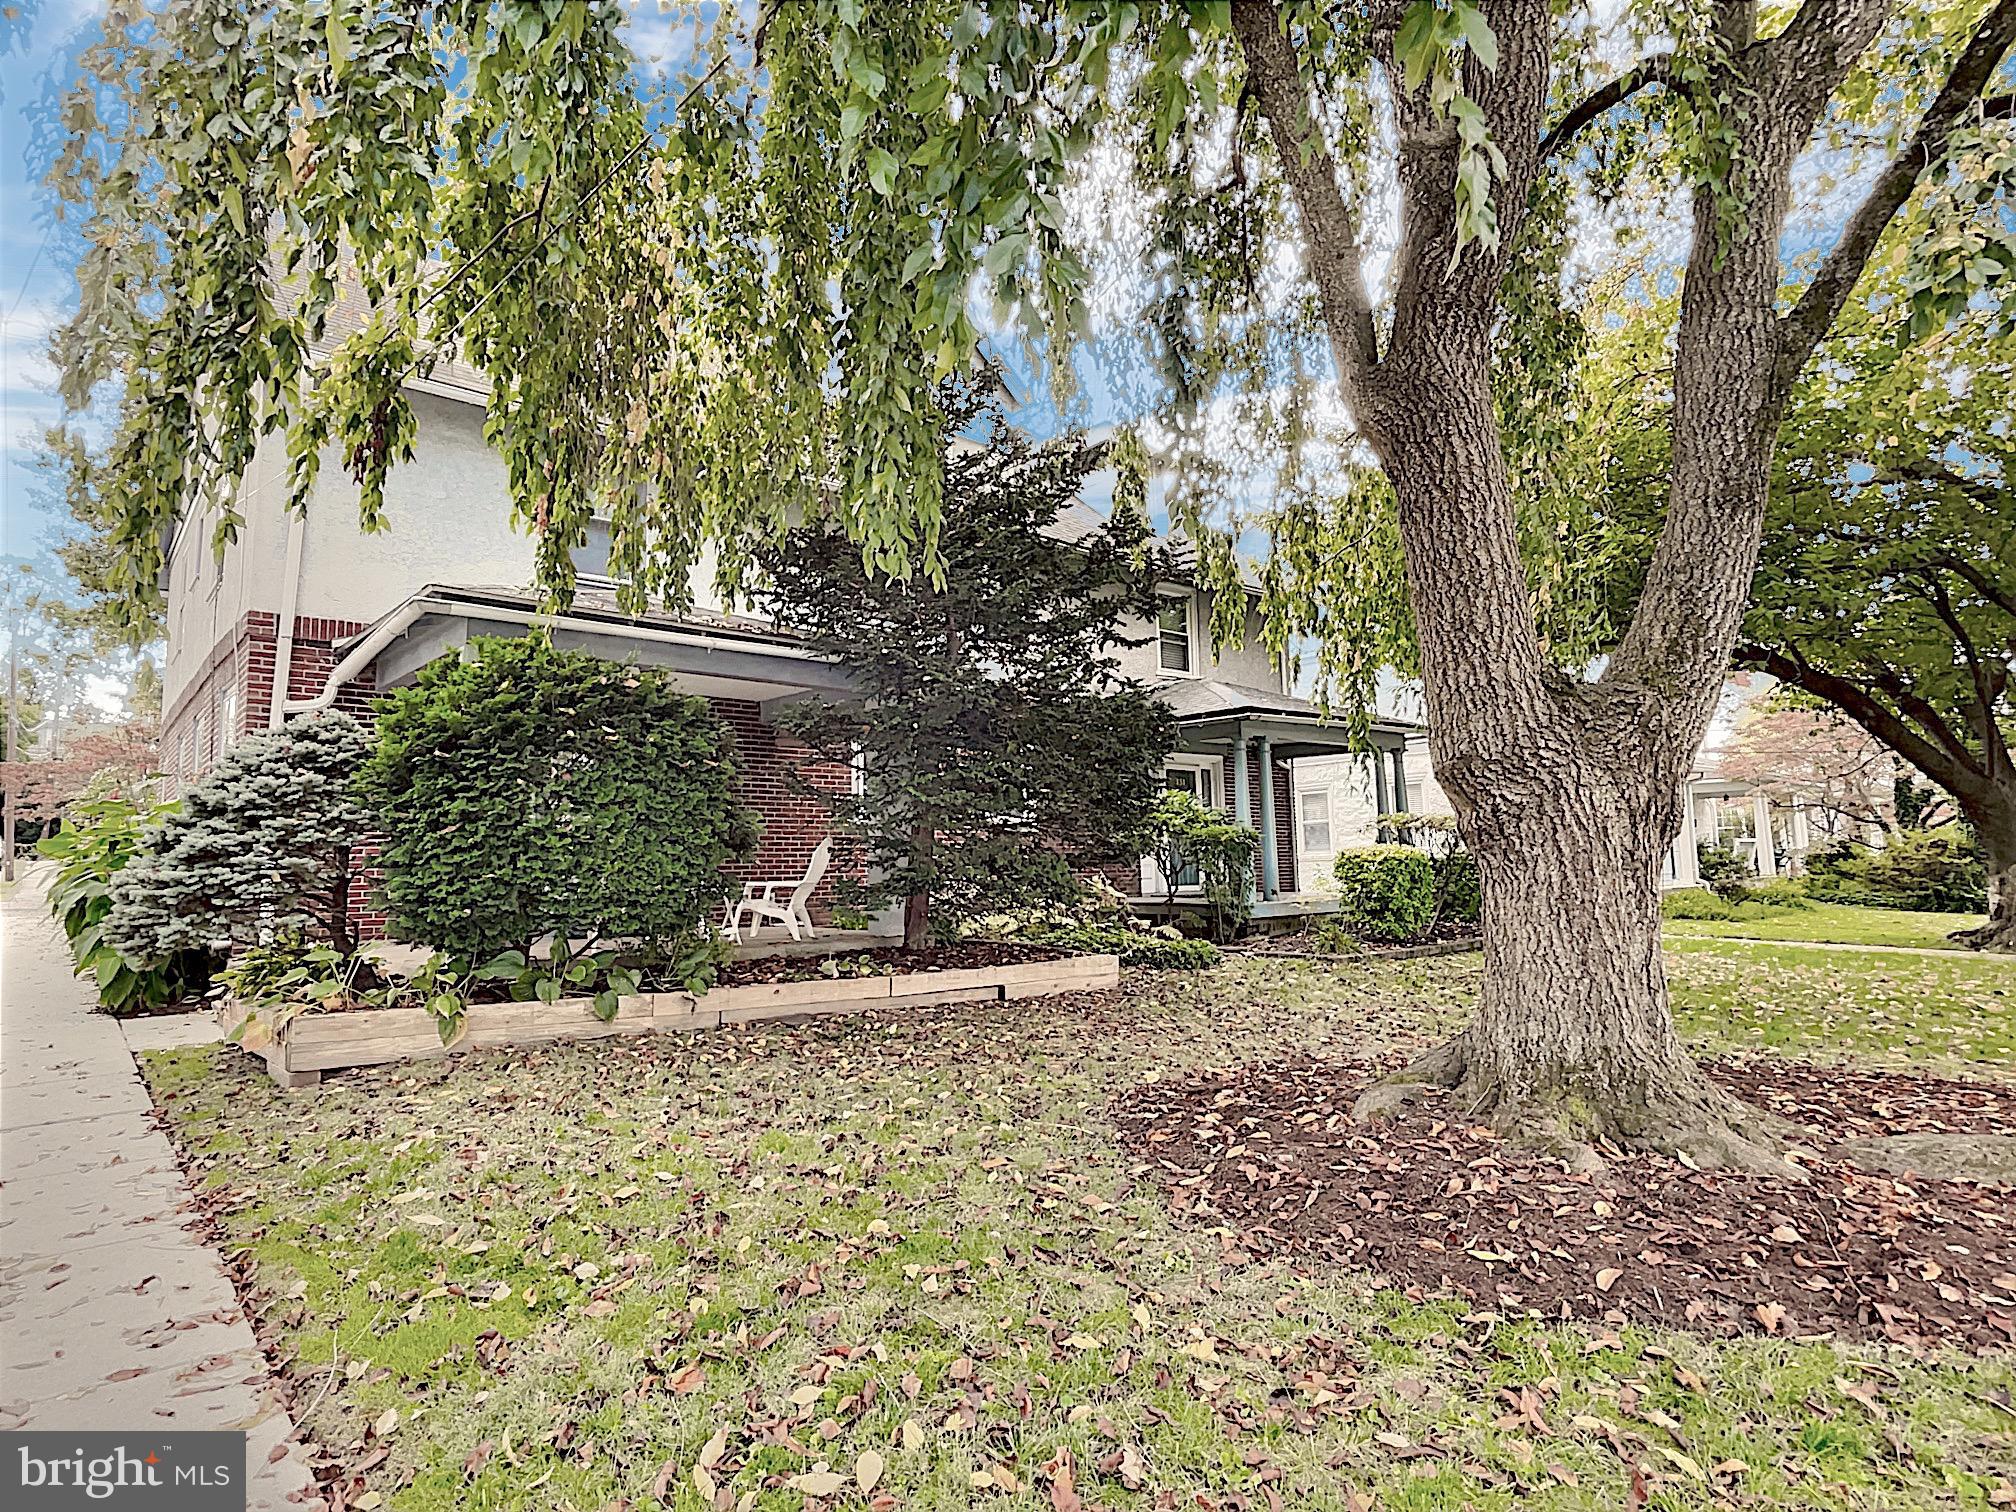 129 Linwood Avenue, Ardmore, PA 19003